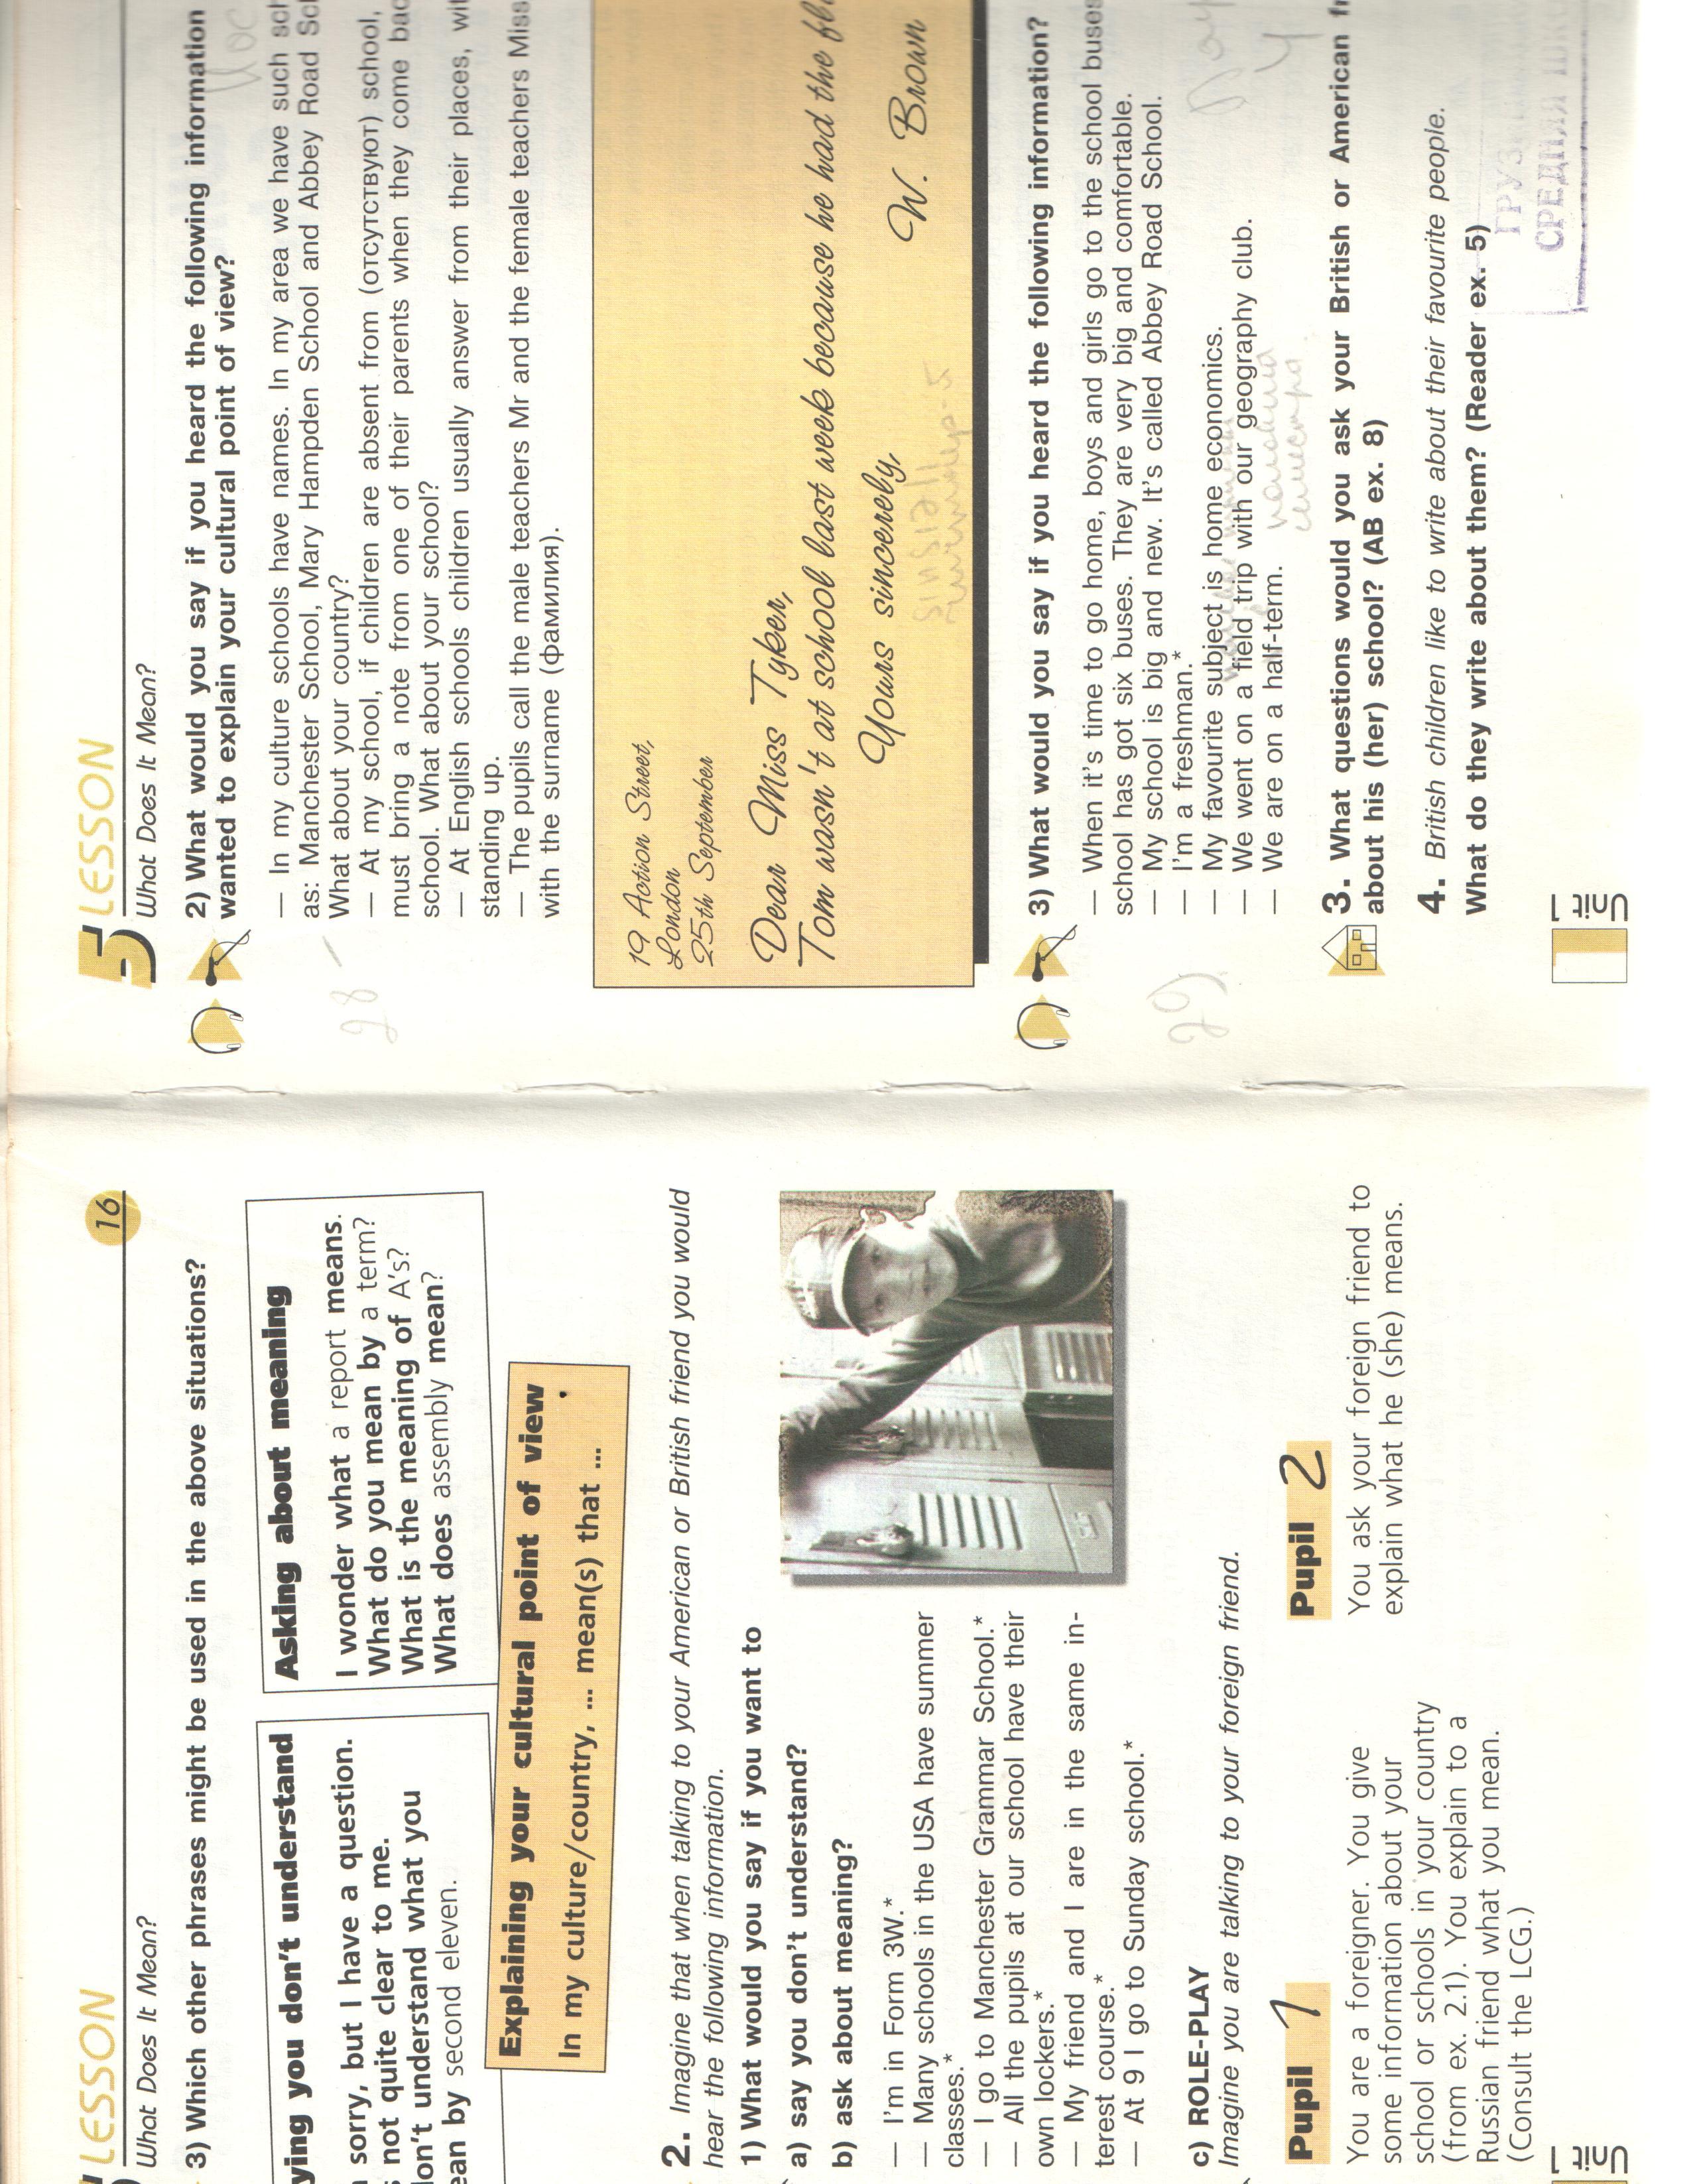 C:\Users\Грузиновская СОШ\Documents\Scanned Documents\Рисунок (2081).jpg